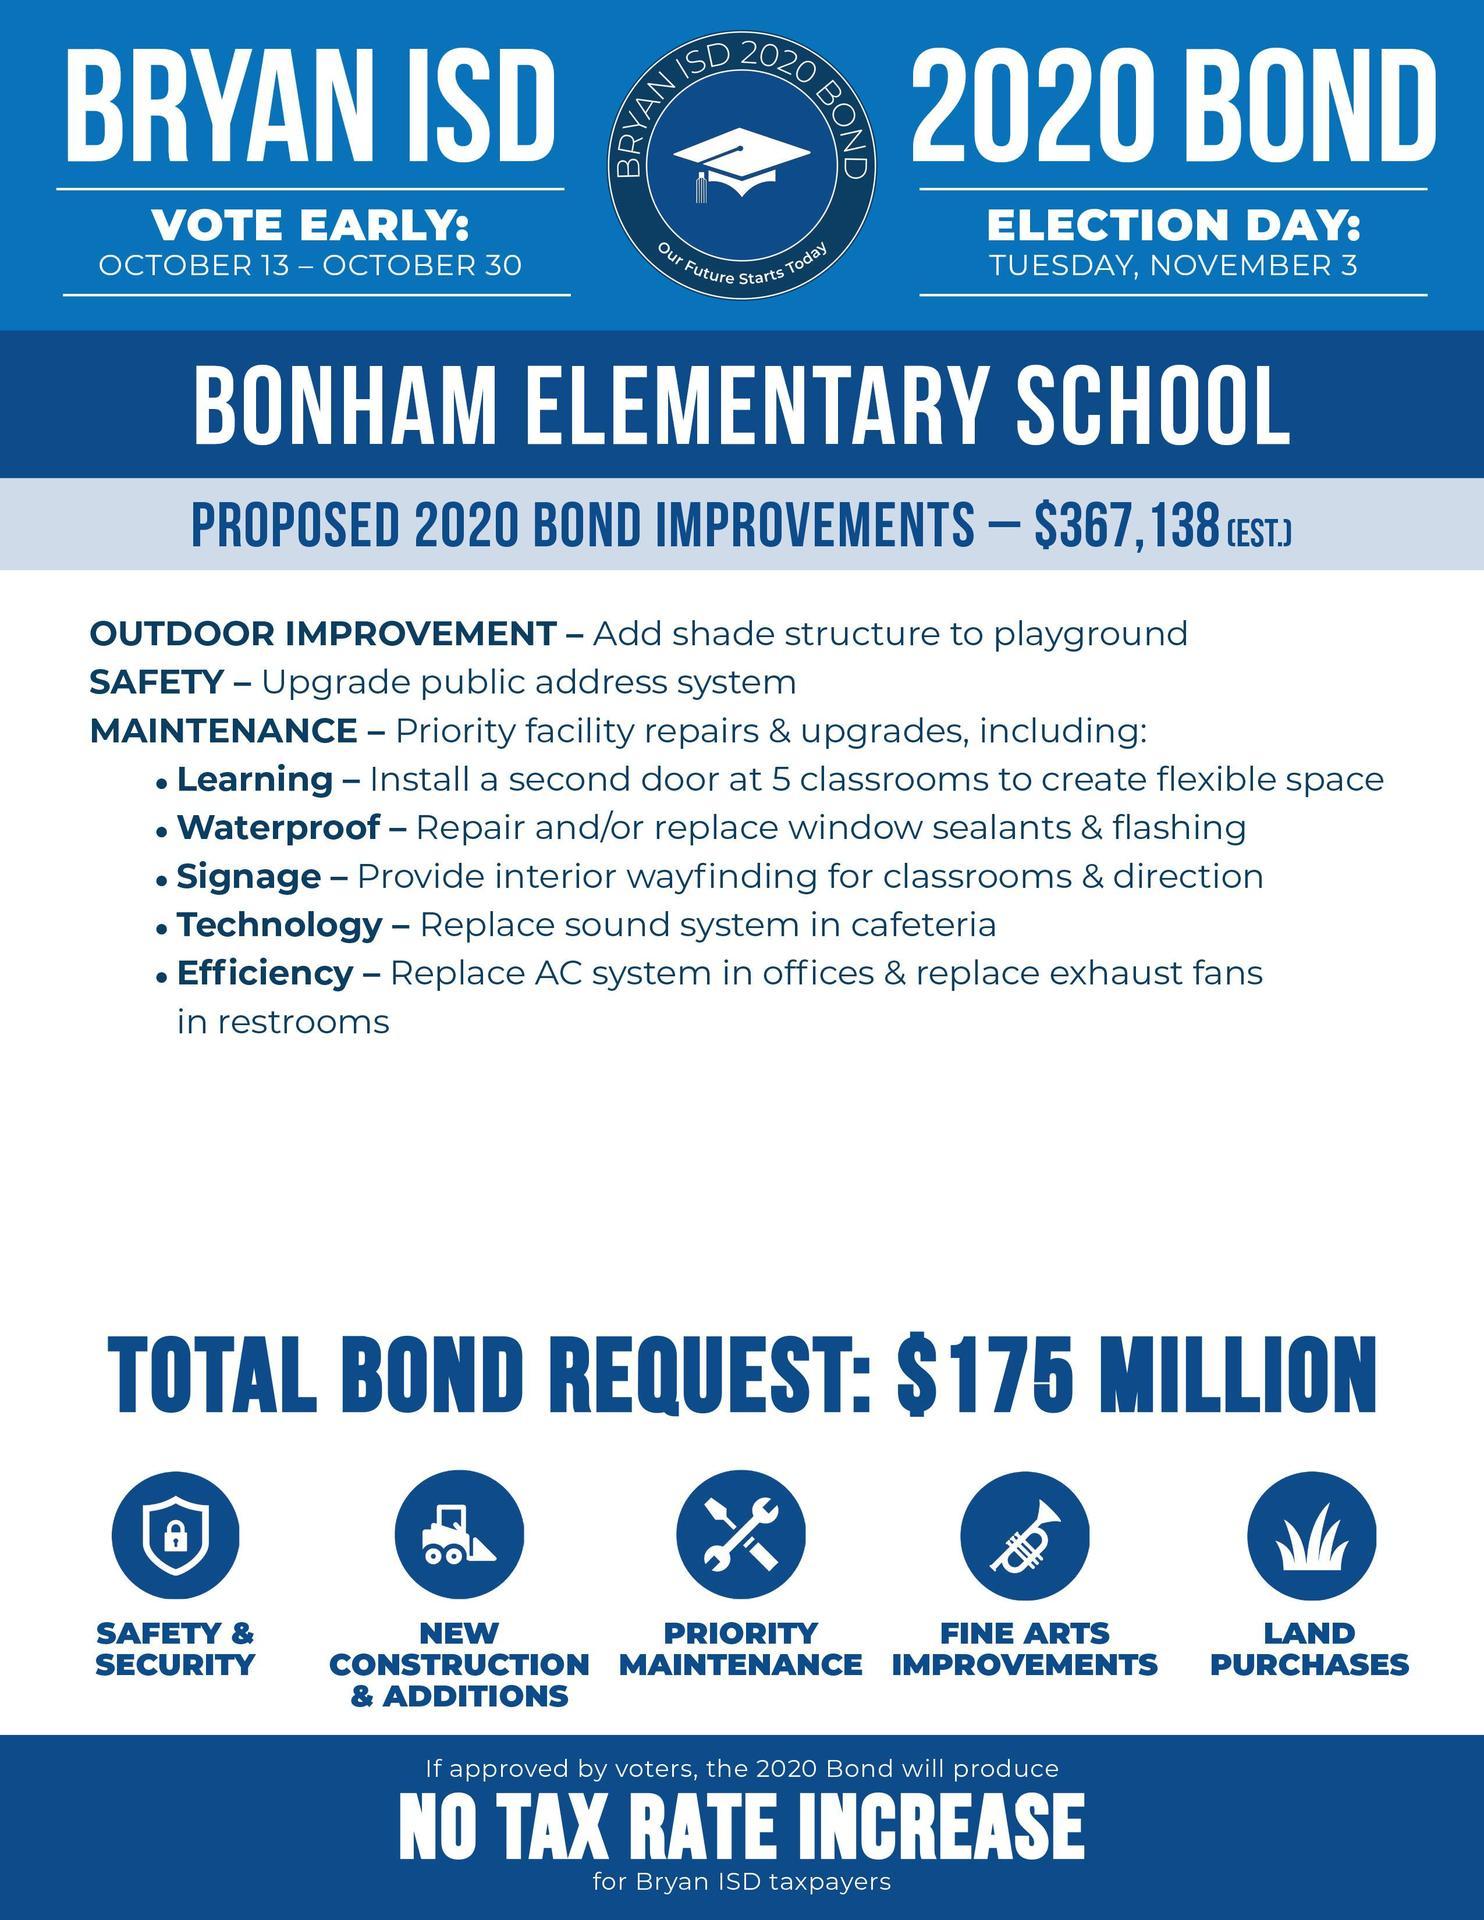 Bonham Elementary School Bond Information